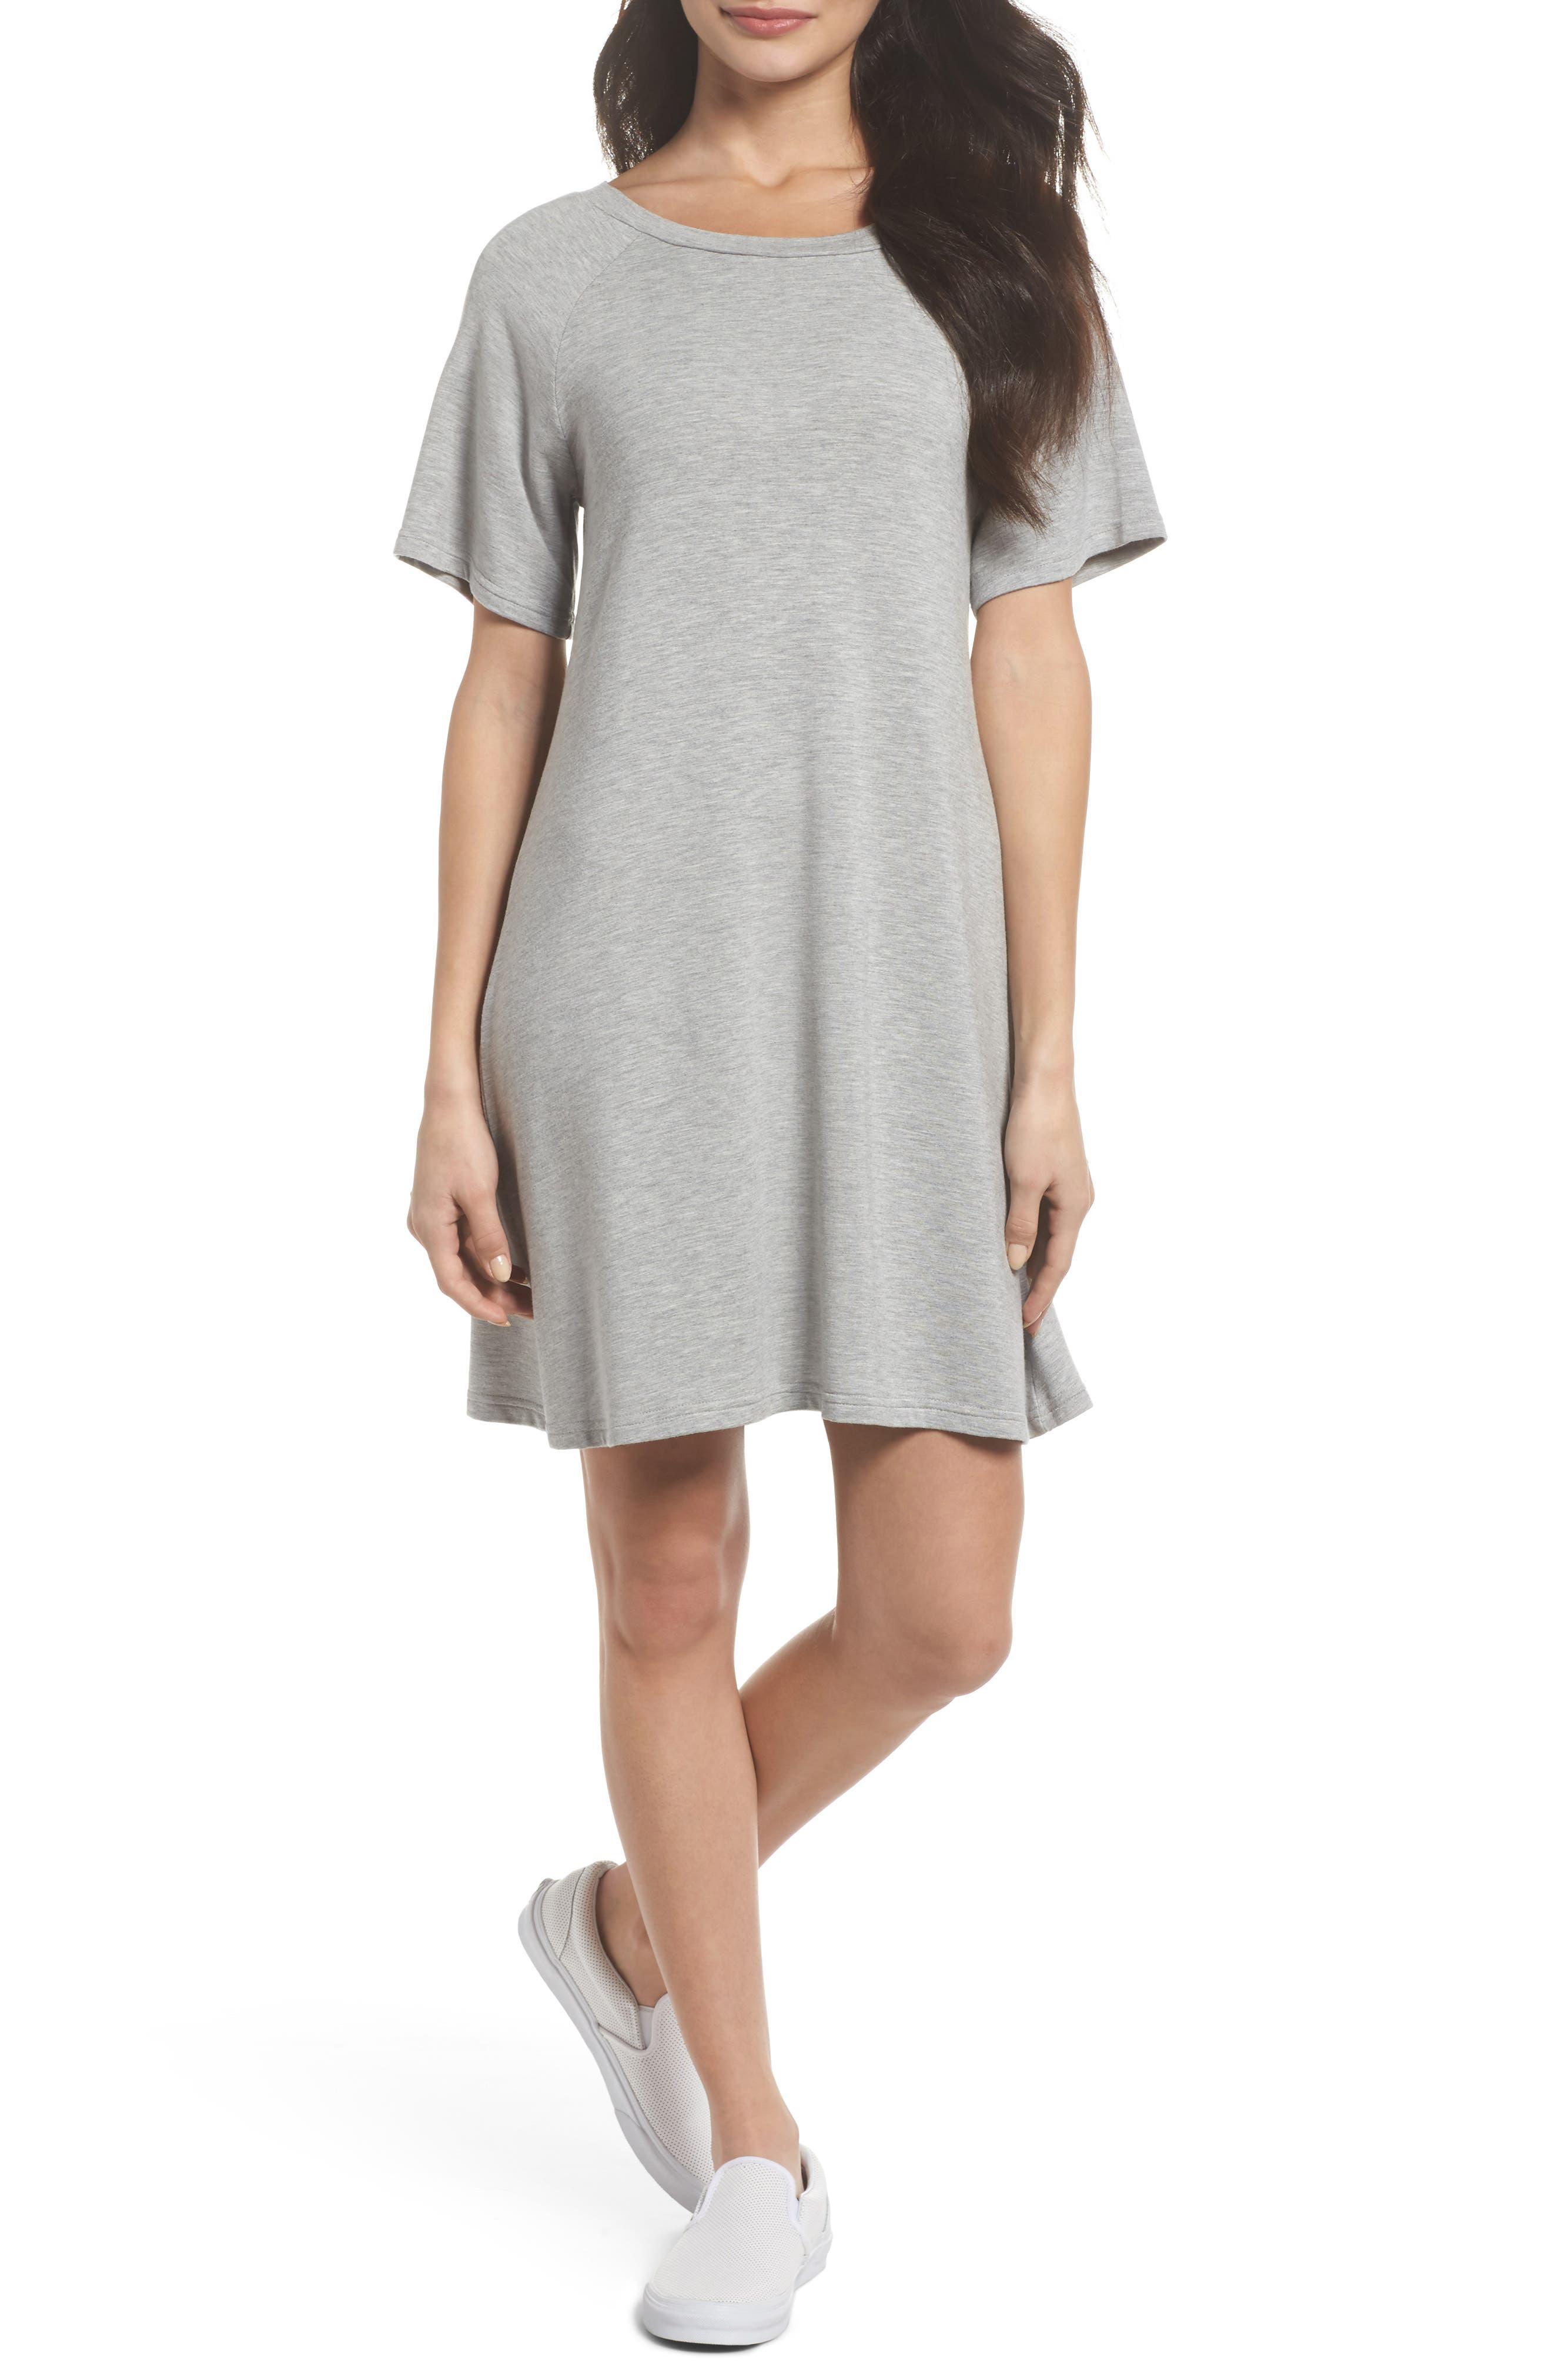 Greer Knit Shift Dress,                         Main,                         color, Light Heather Grey